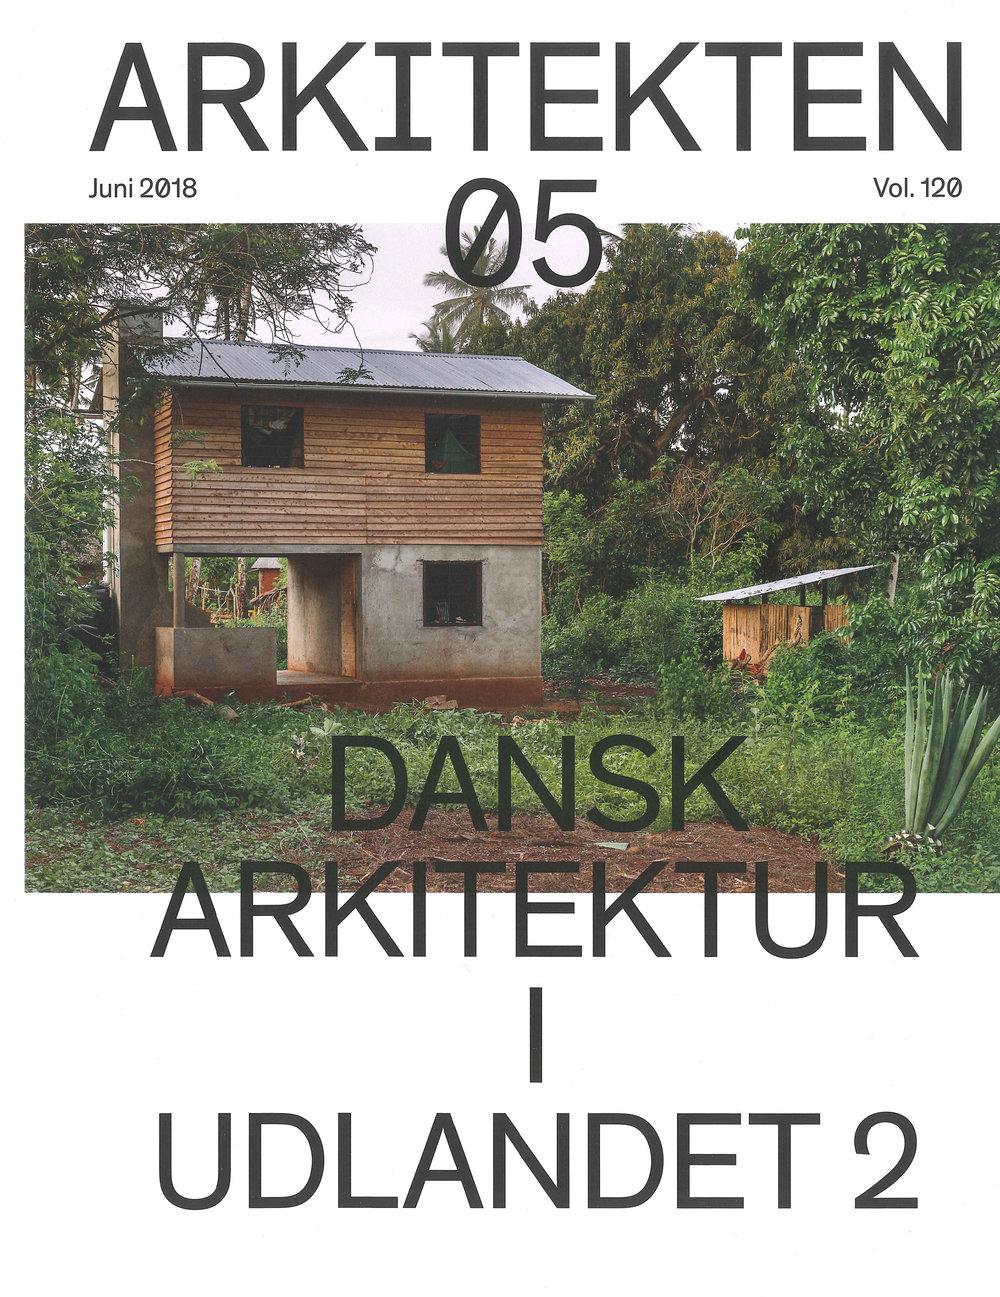 20180620 Arkitekten - Marina Interchange-1.jpg